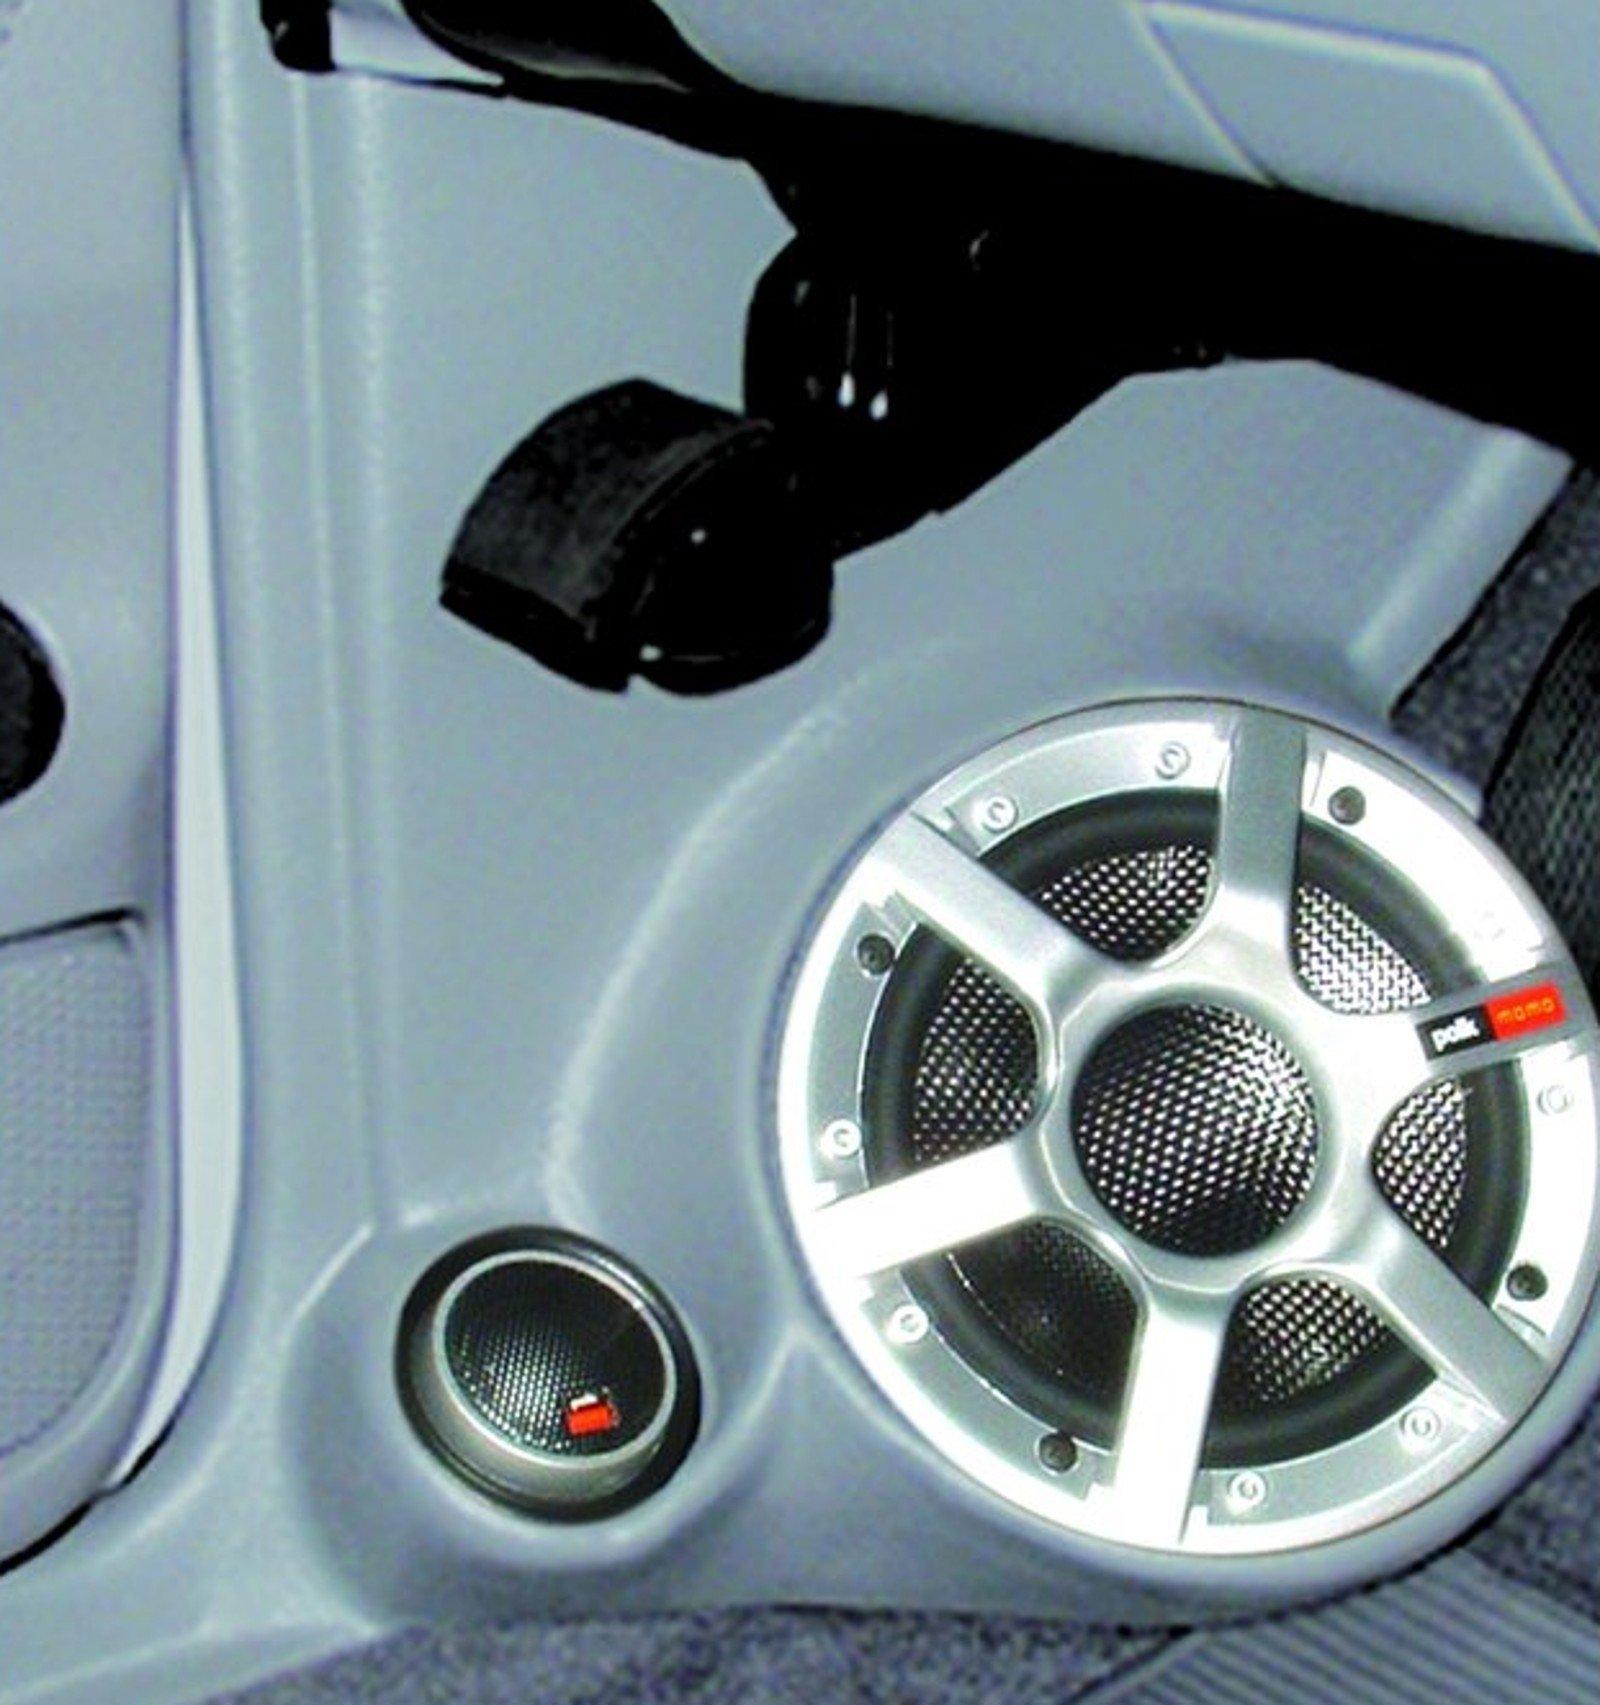 Q Logic Q Forms 6.5'' Kick Panel Speaker Enclosures for Ford / Mazda / Ranger / B-Series